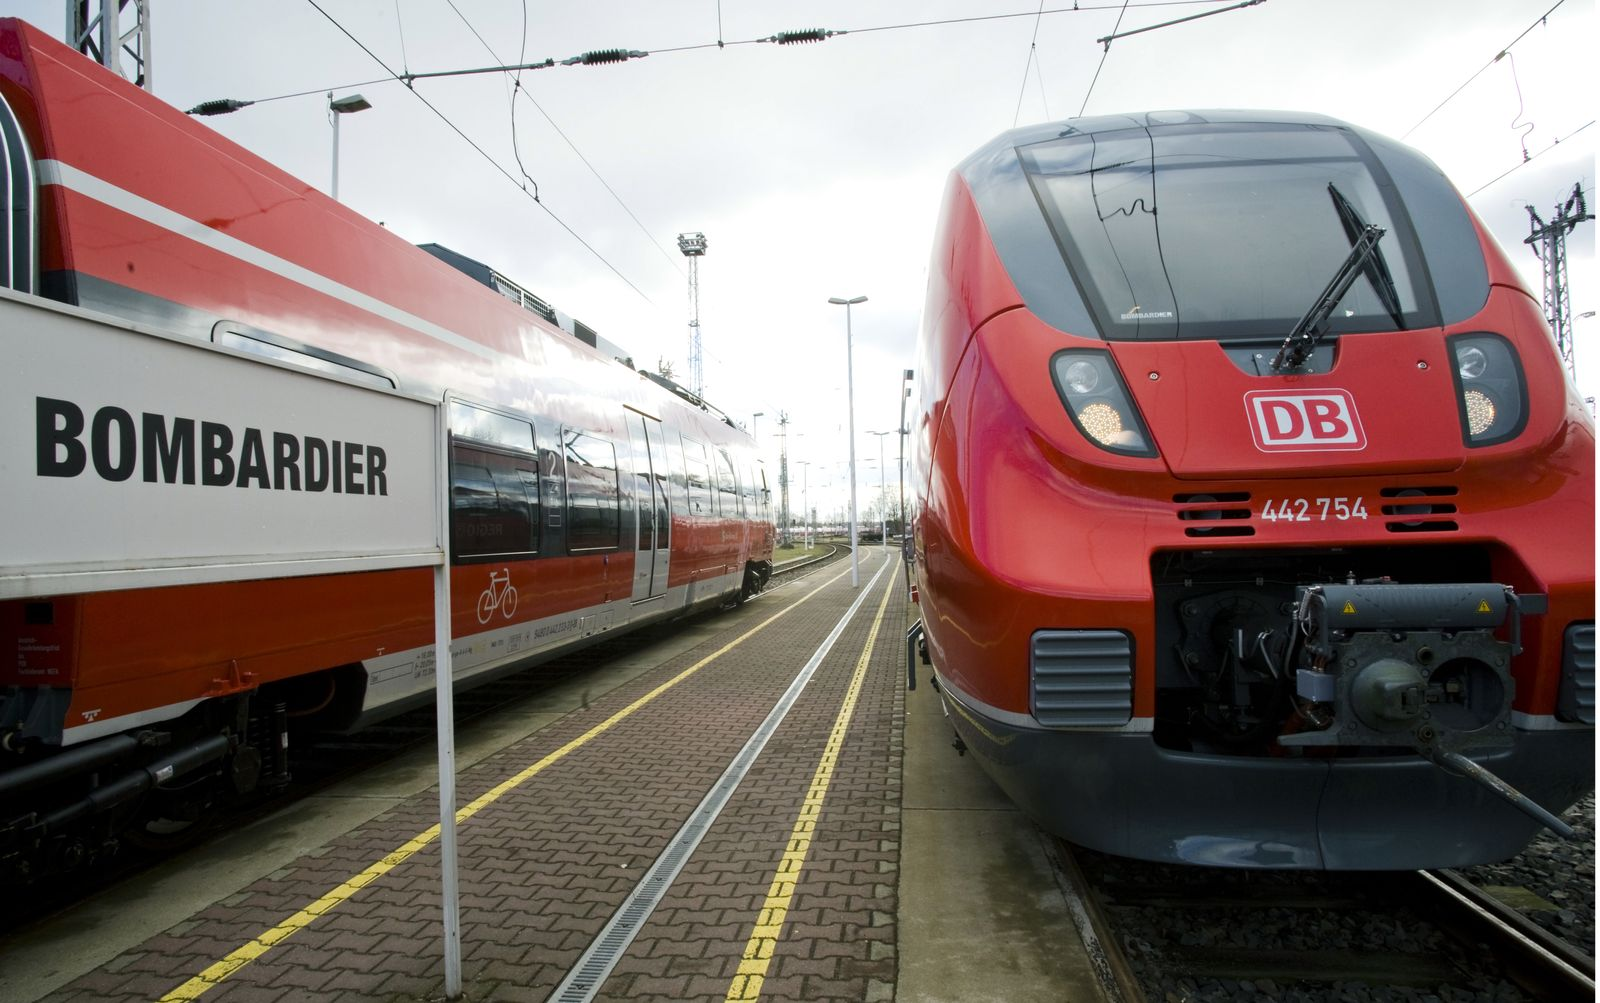 Deutsche Bahn / Bombardier-Werk in Hennigsdorf